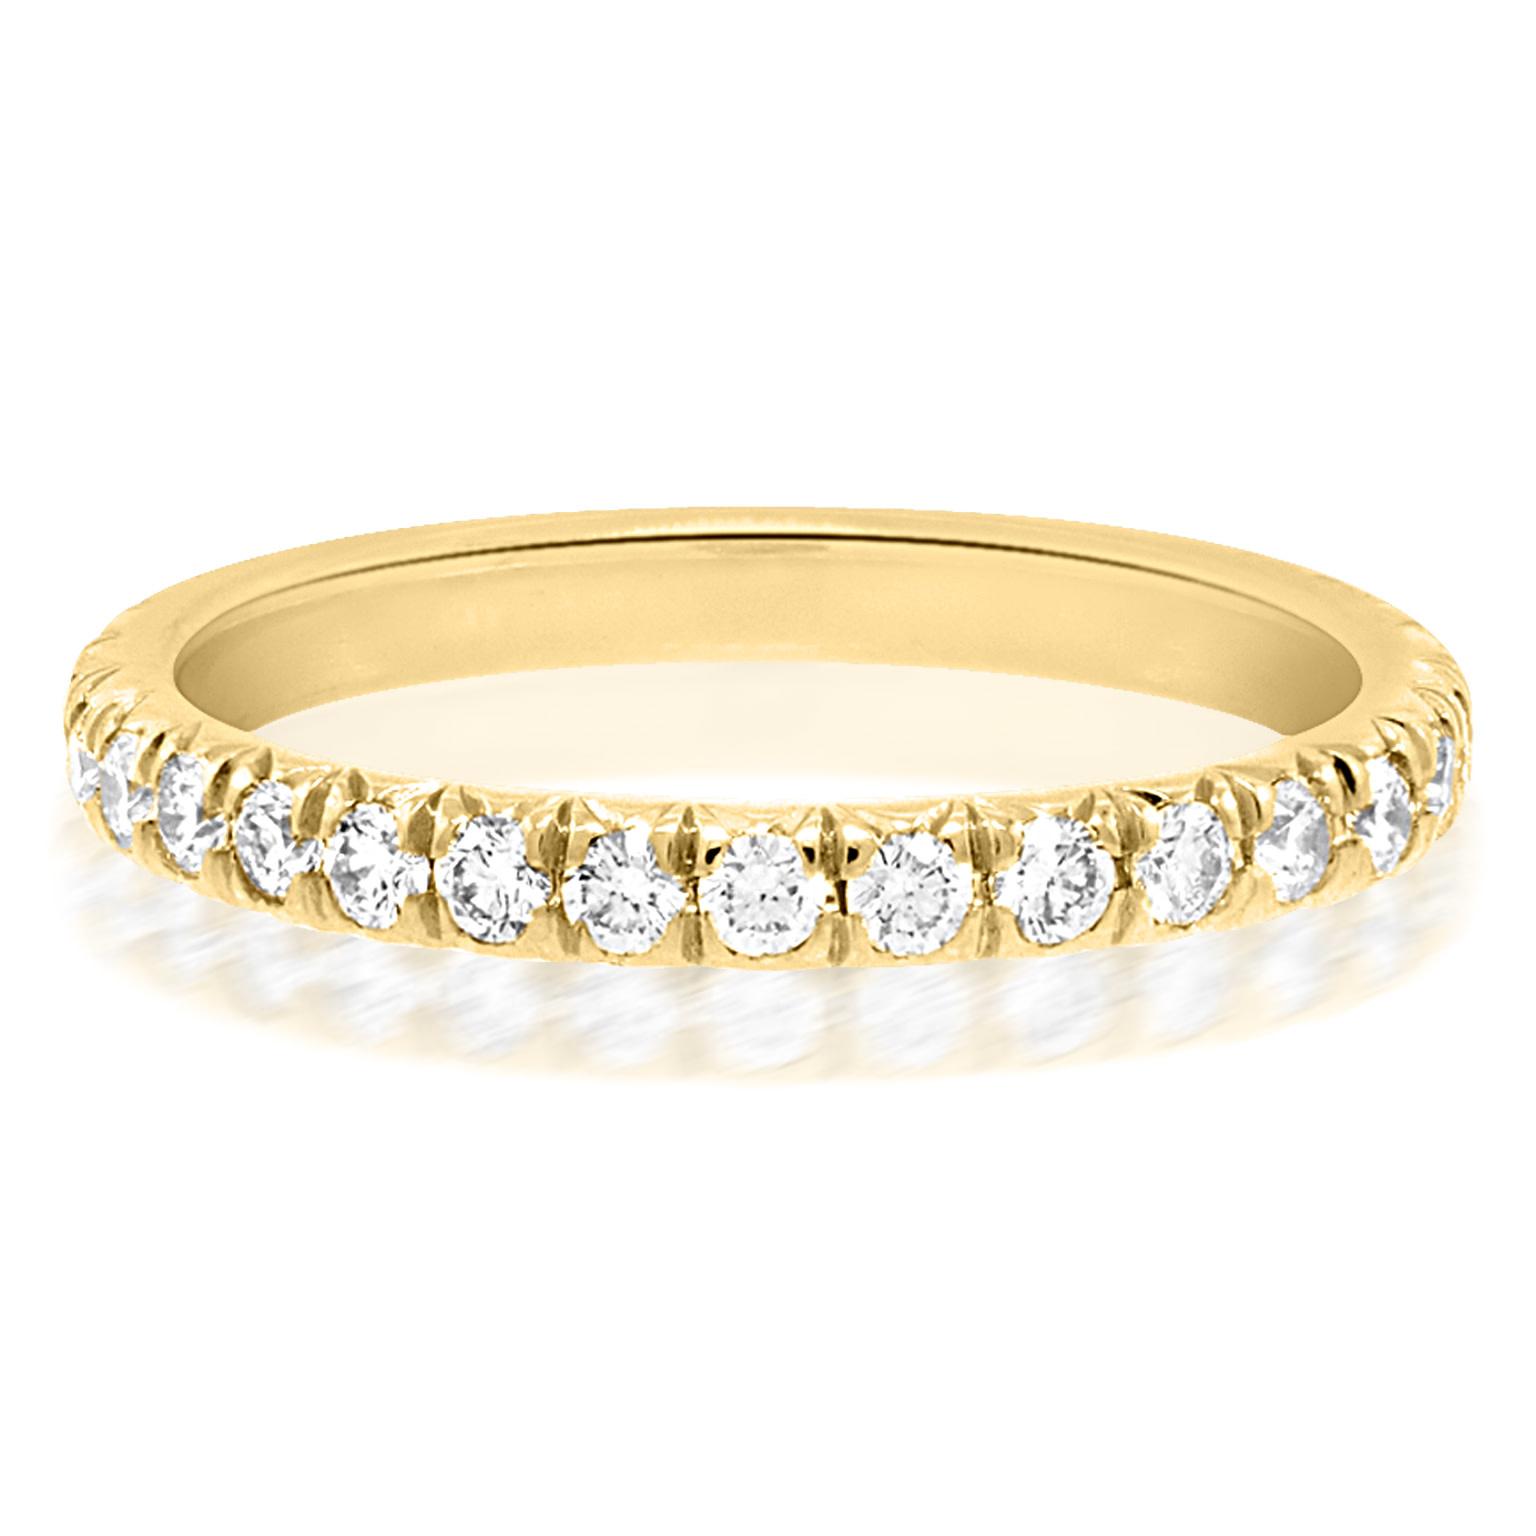 Trabert Goldsmiths Large Linea French Pave Diamond Yellow Gold Eternity Ring